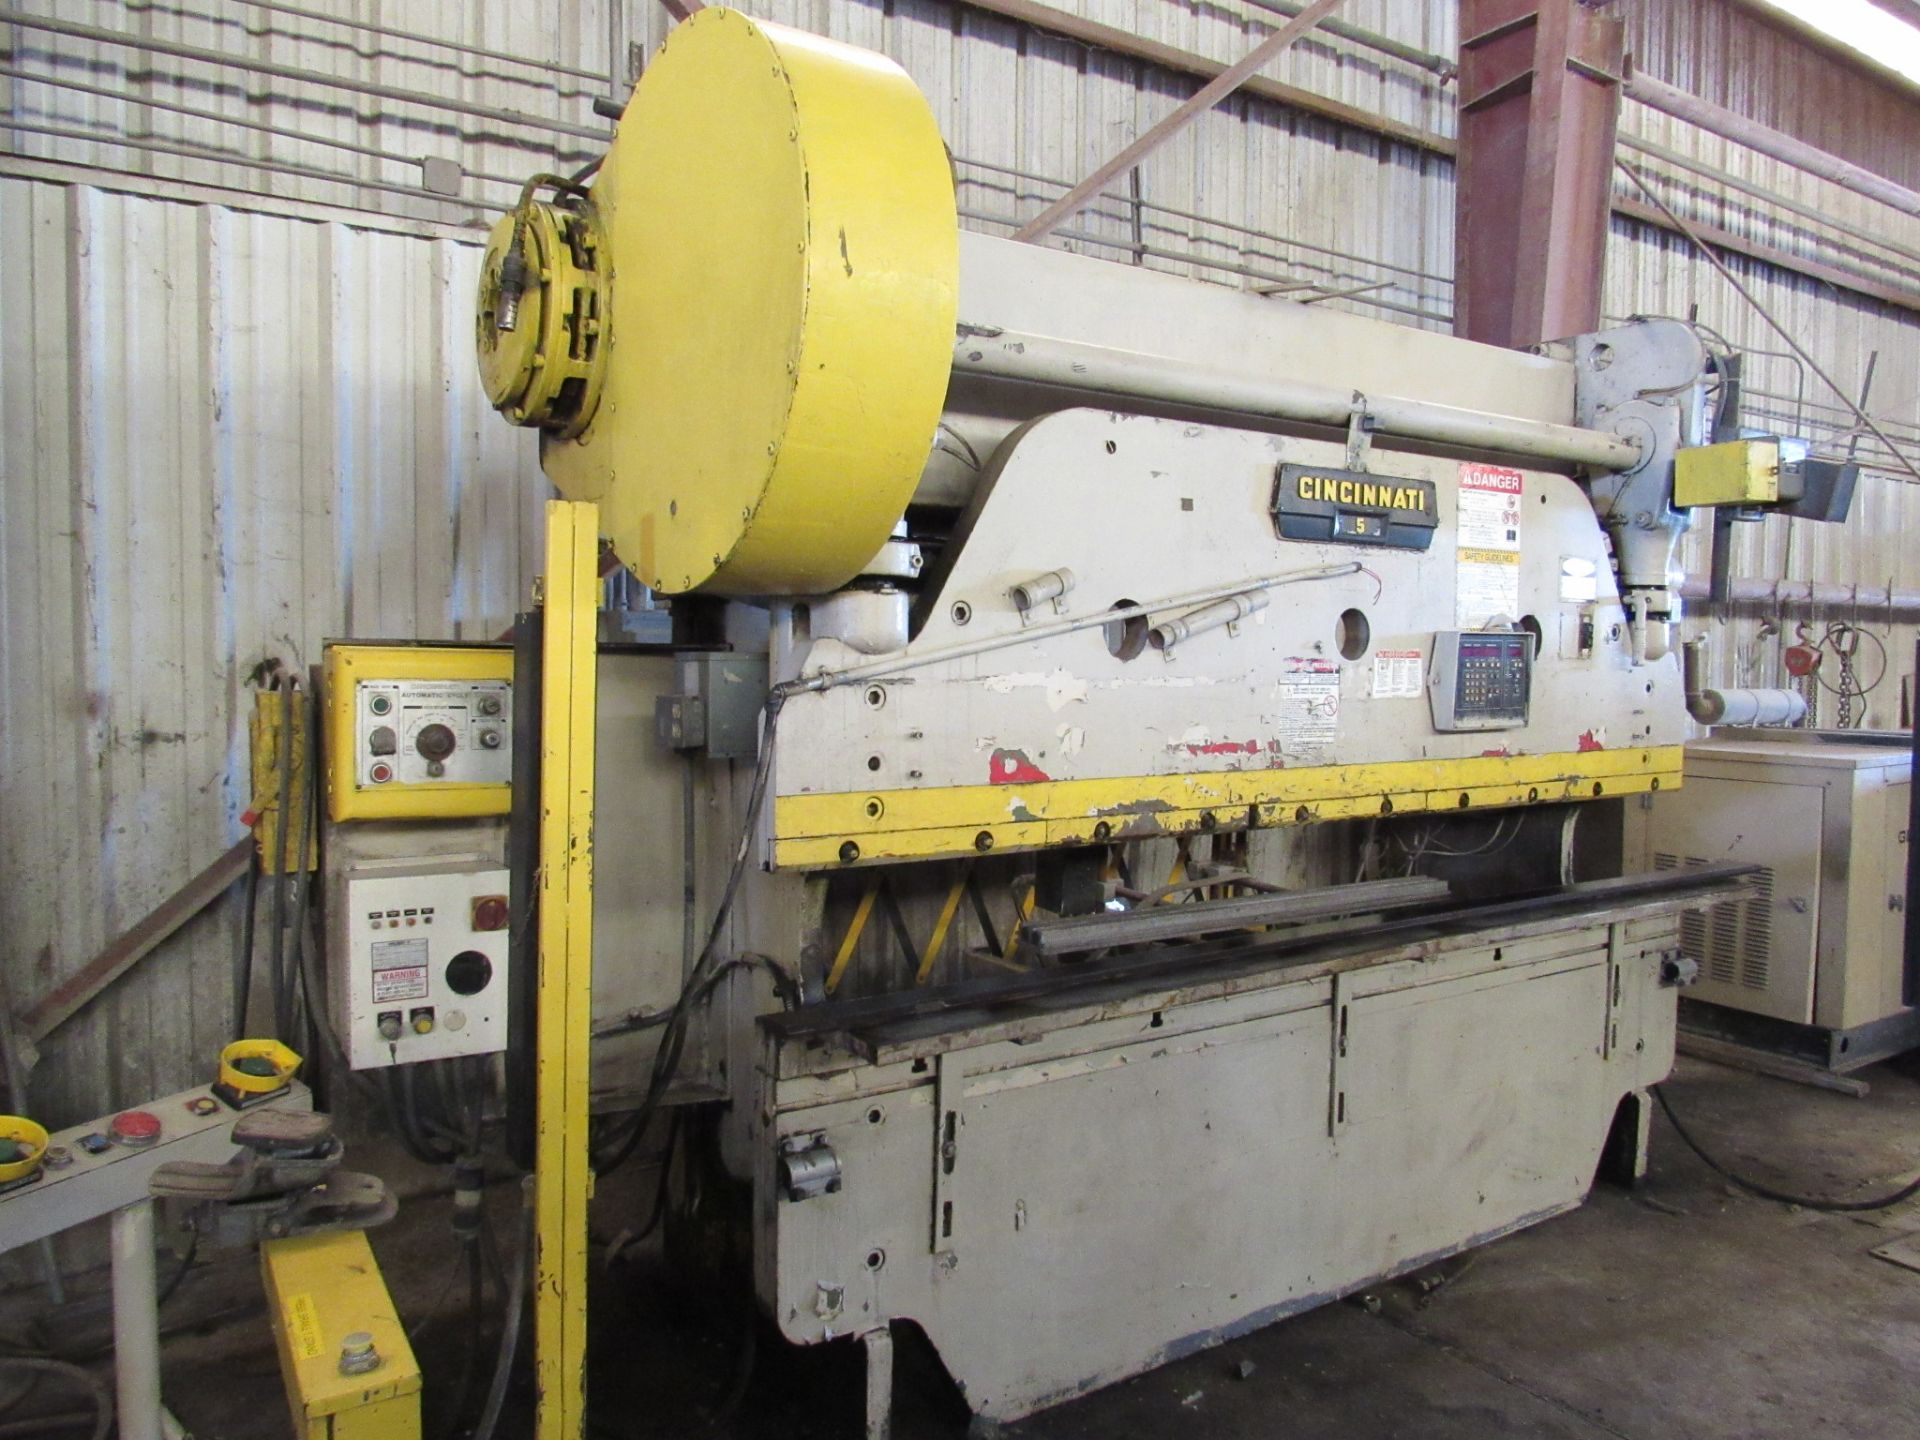 Cincinnati No. 5 Mechanical Press Brake - Image 2 of 5